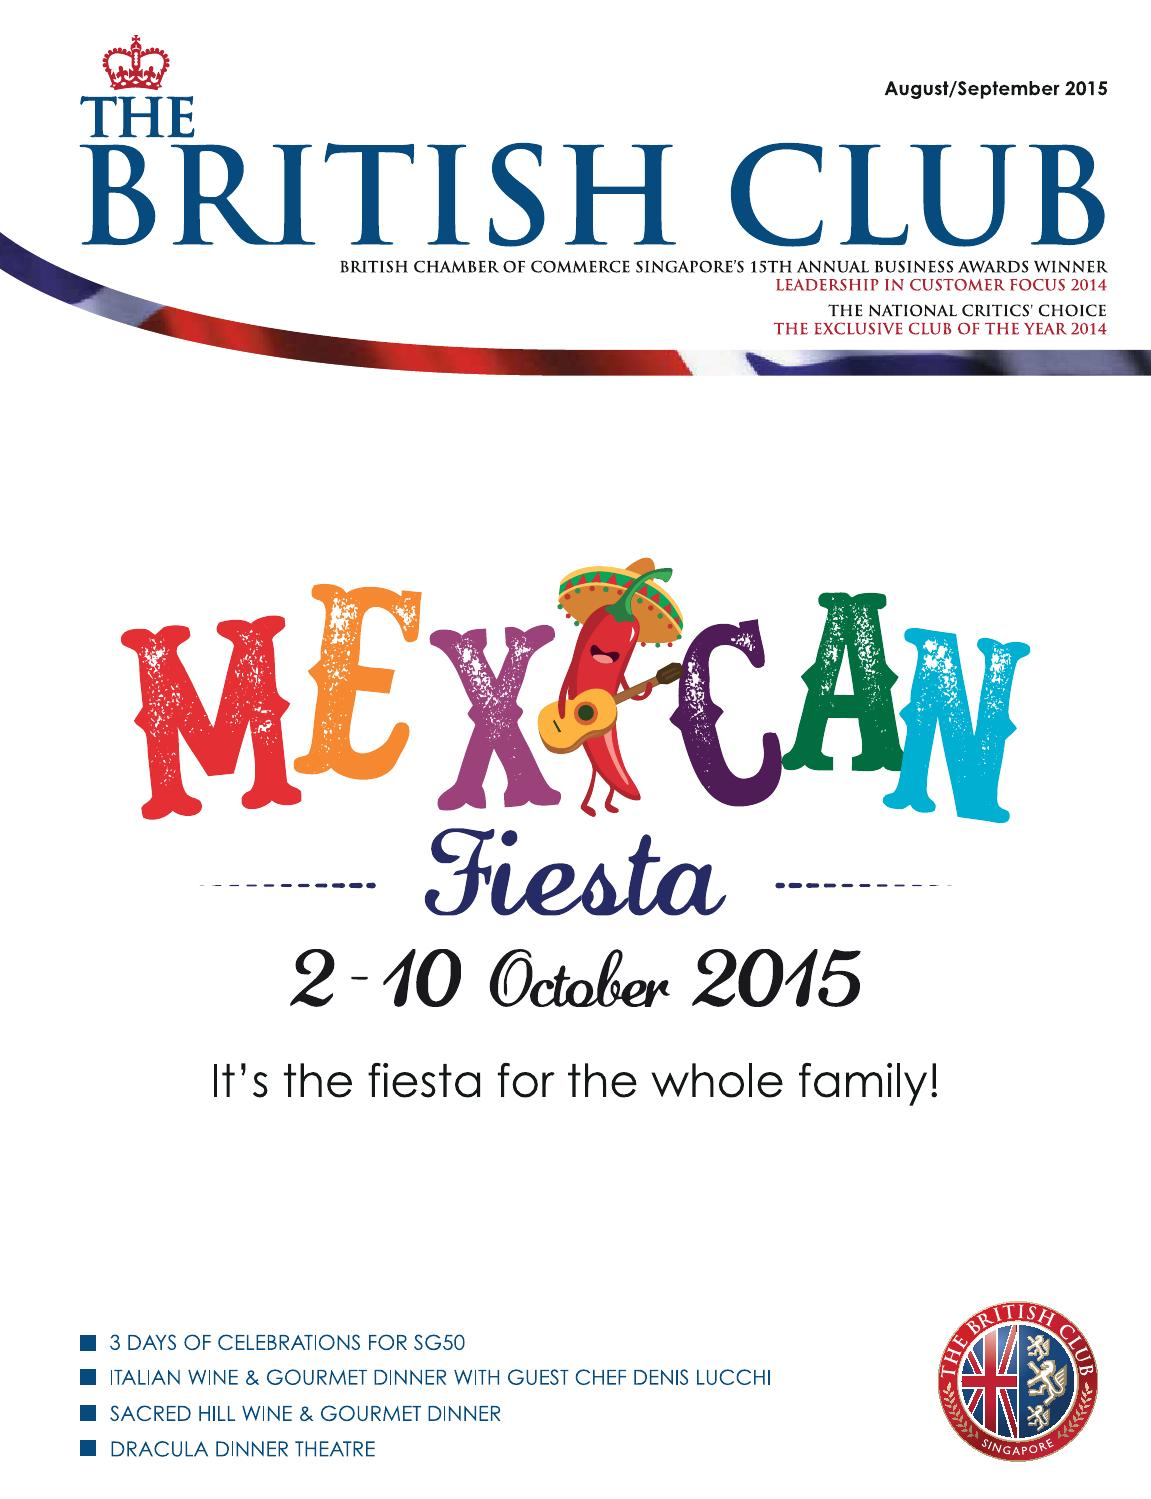 Aug/Sept 2015 by The British Club - issuu